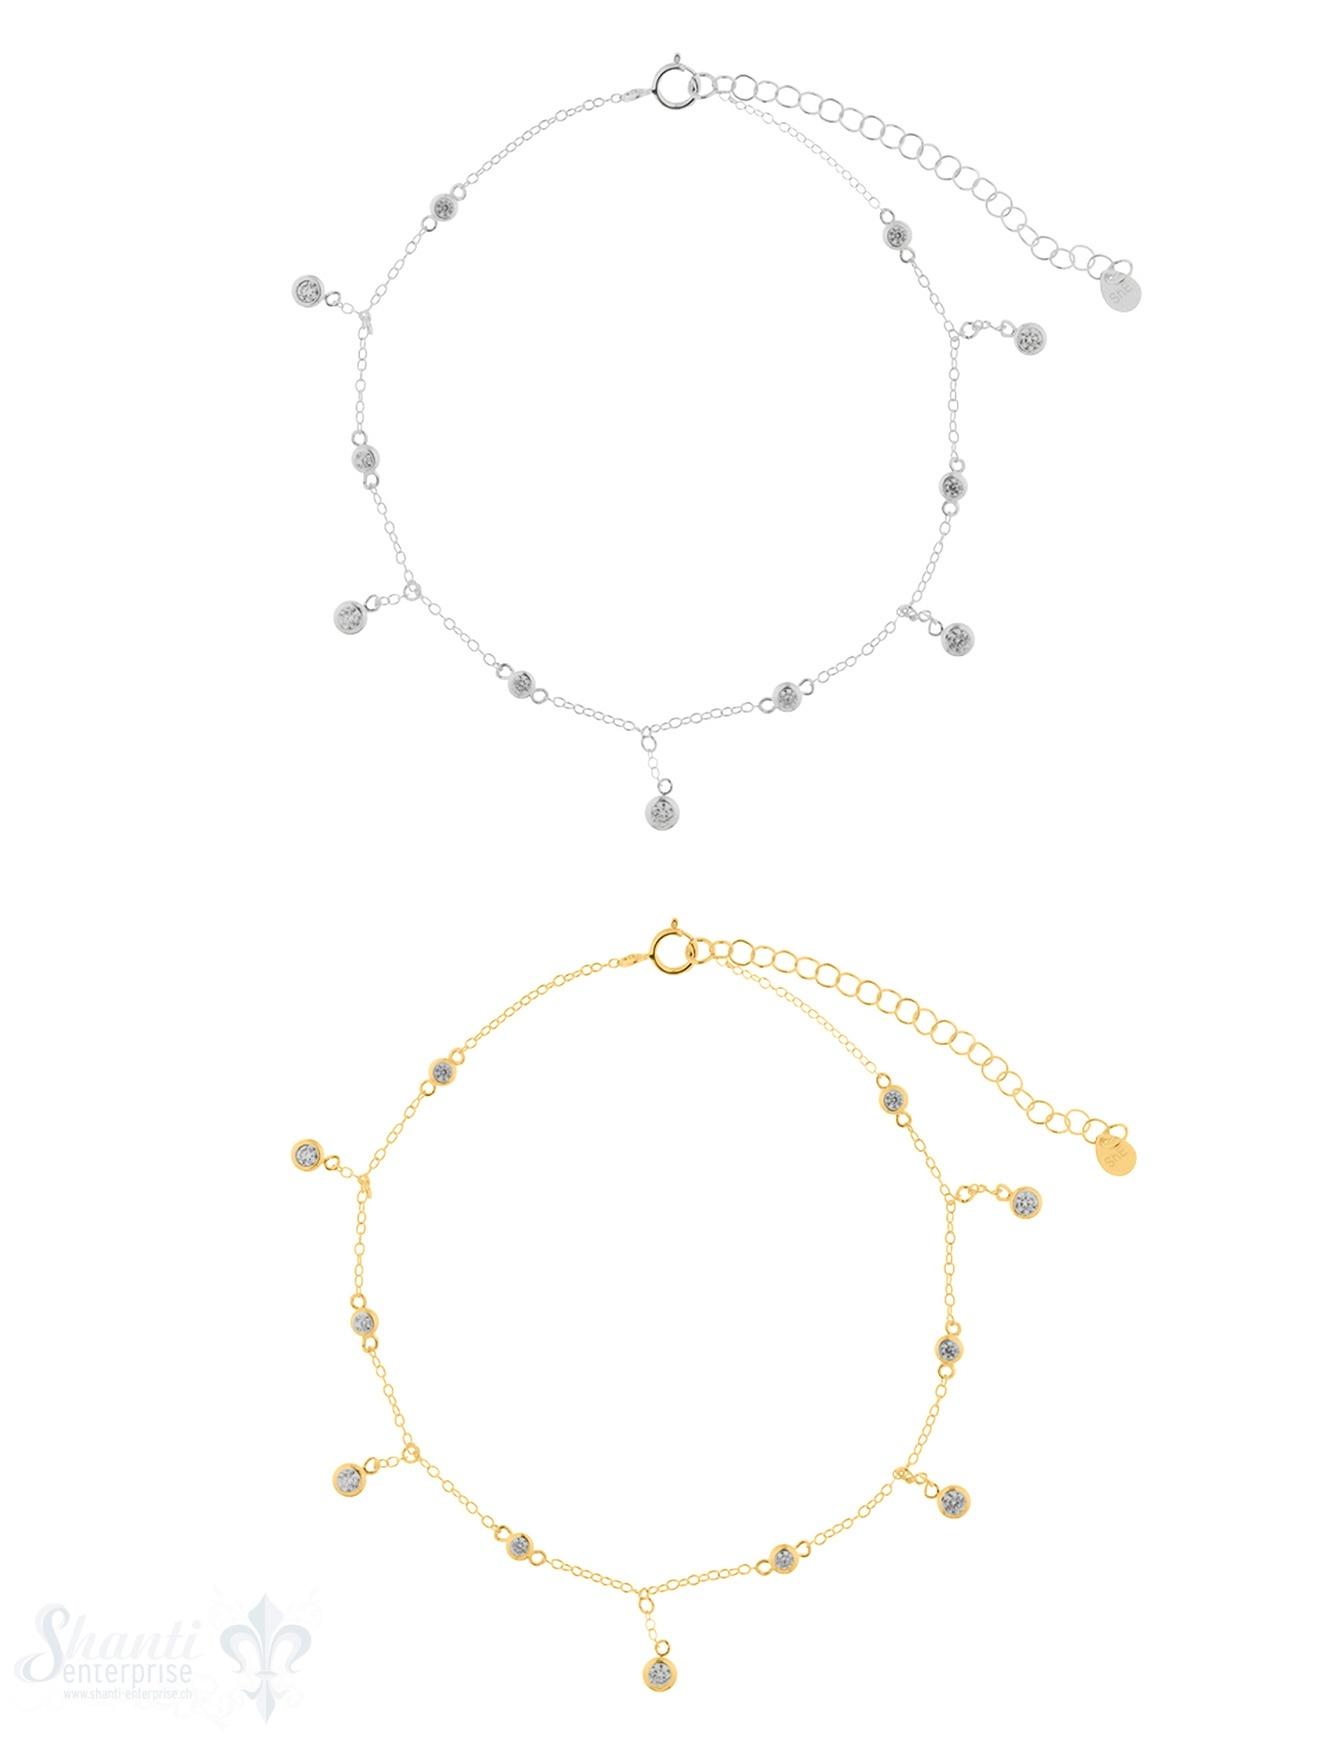 Fussketteli Silber Anker mit Zirkonia kurz/lang